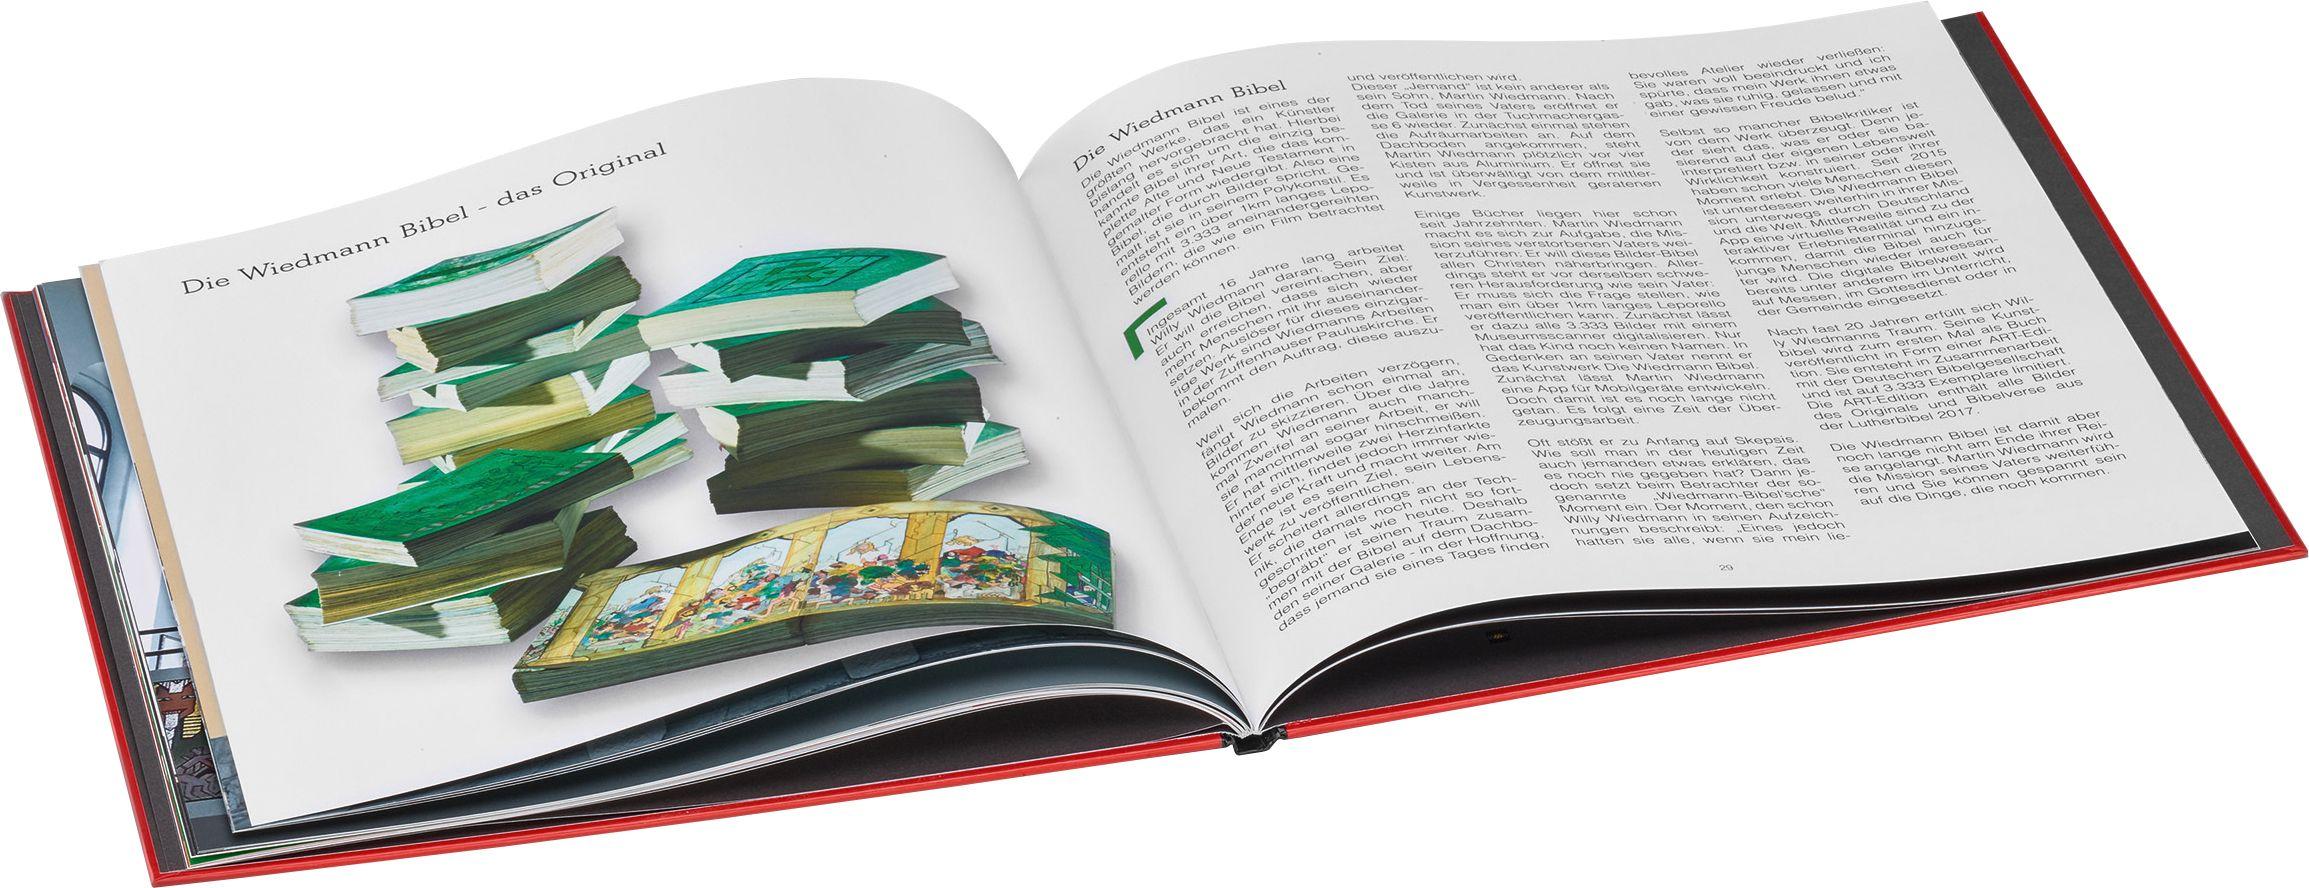 The Wiedmann Bible - Press Photos and Multimedia